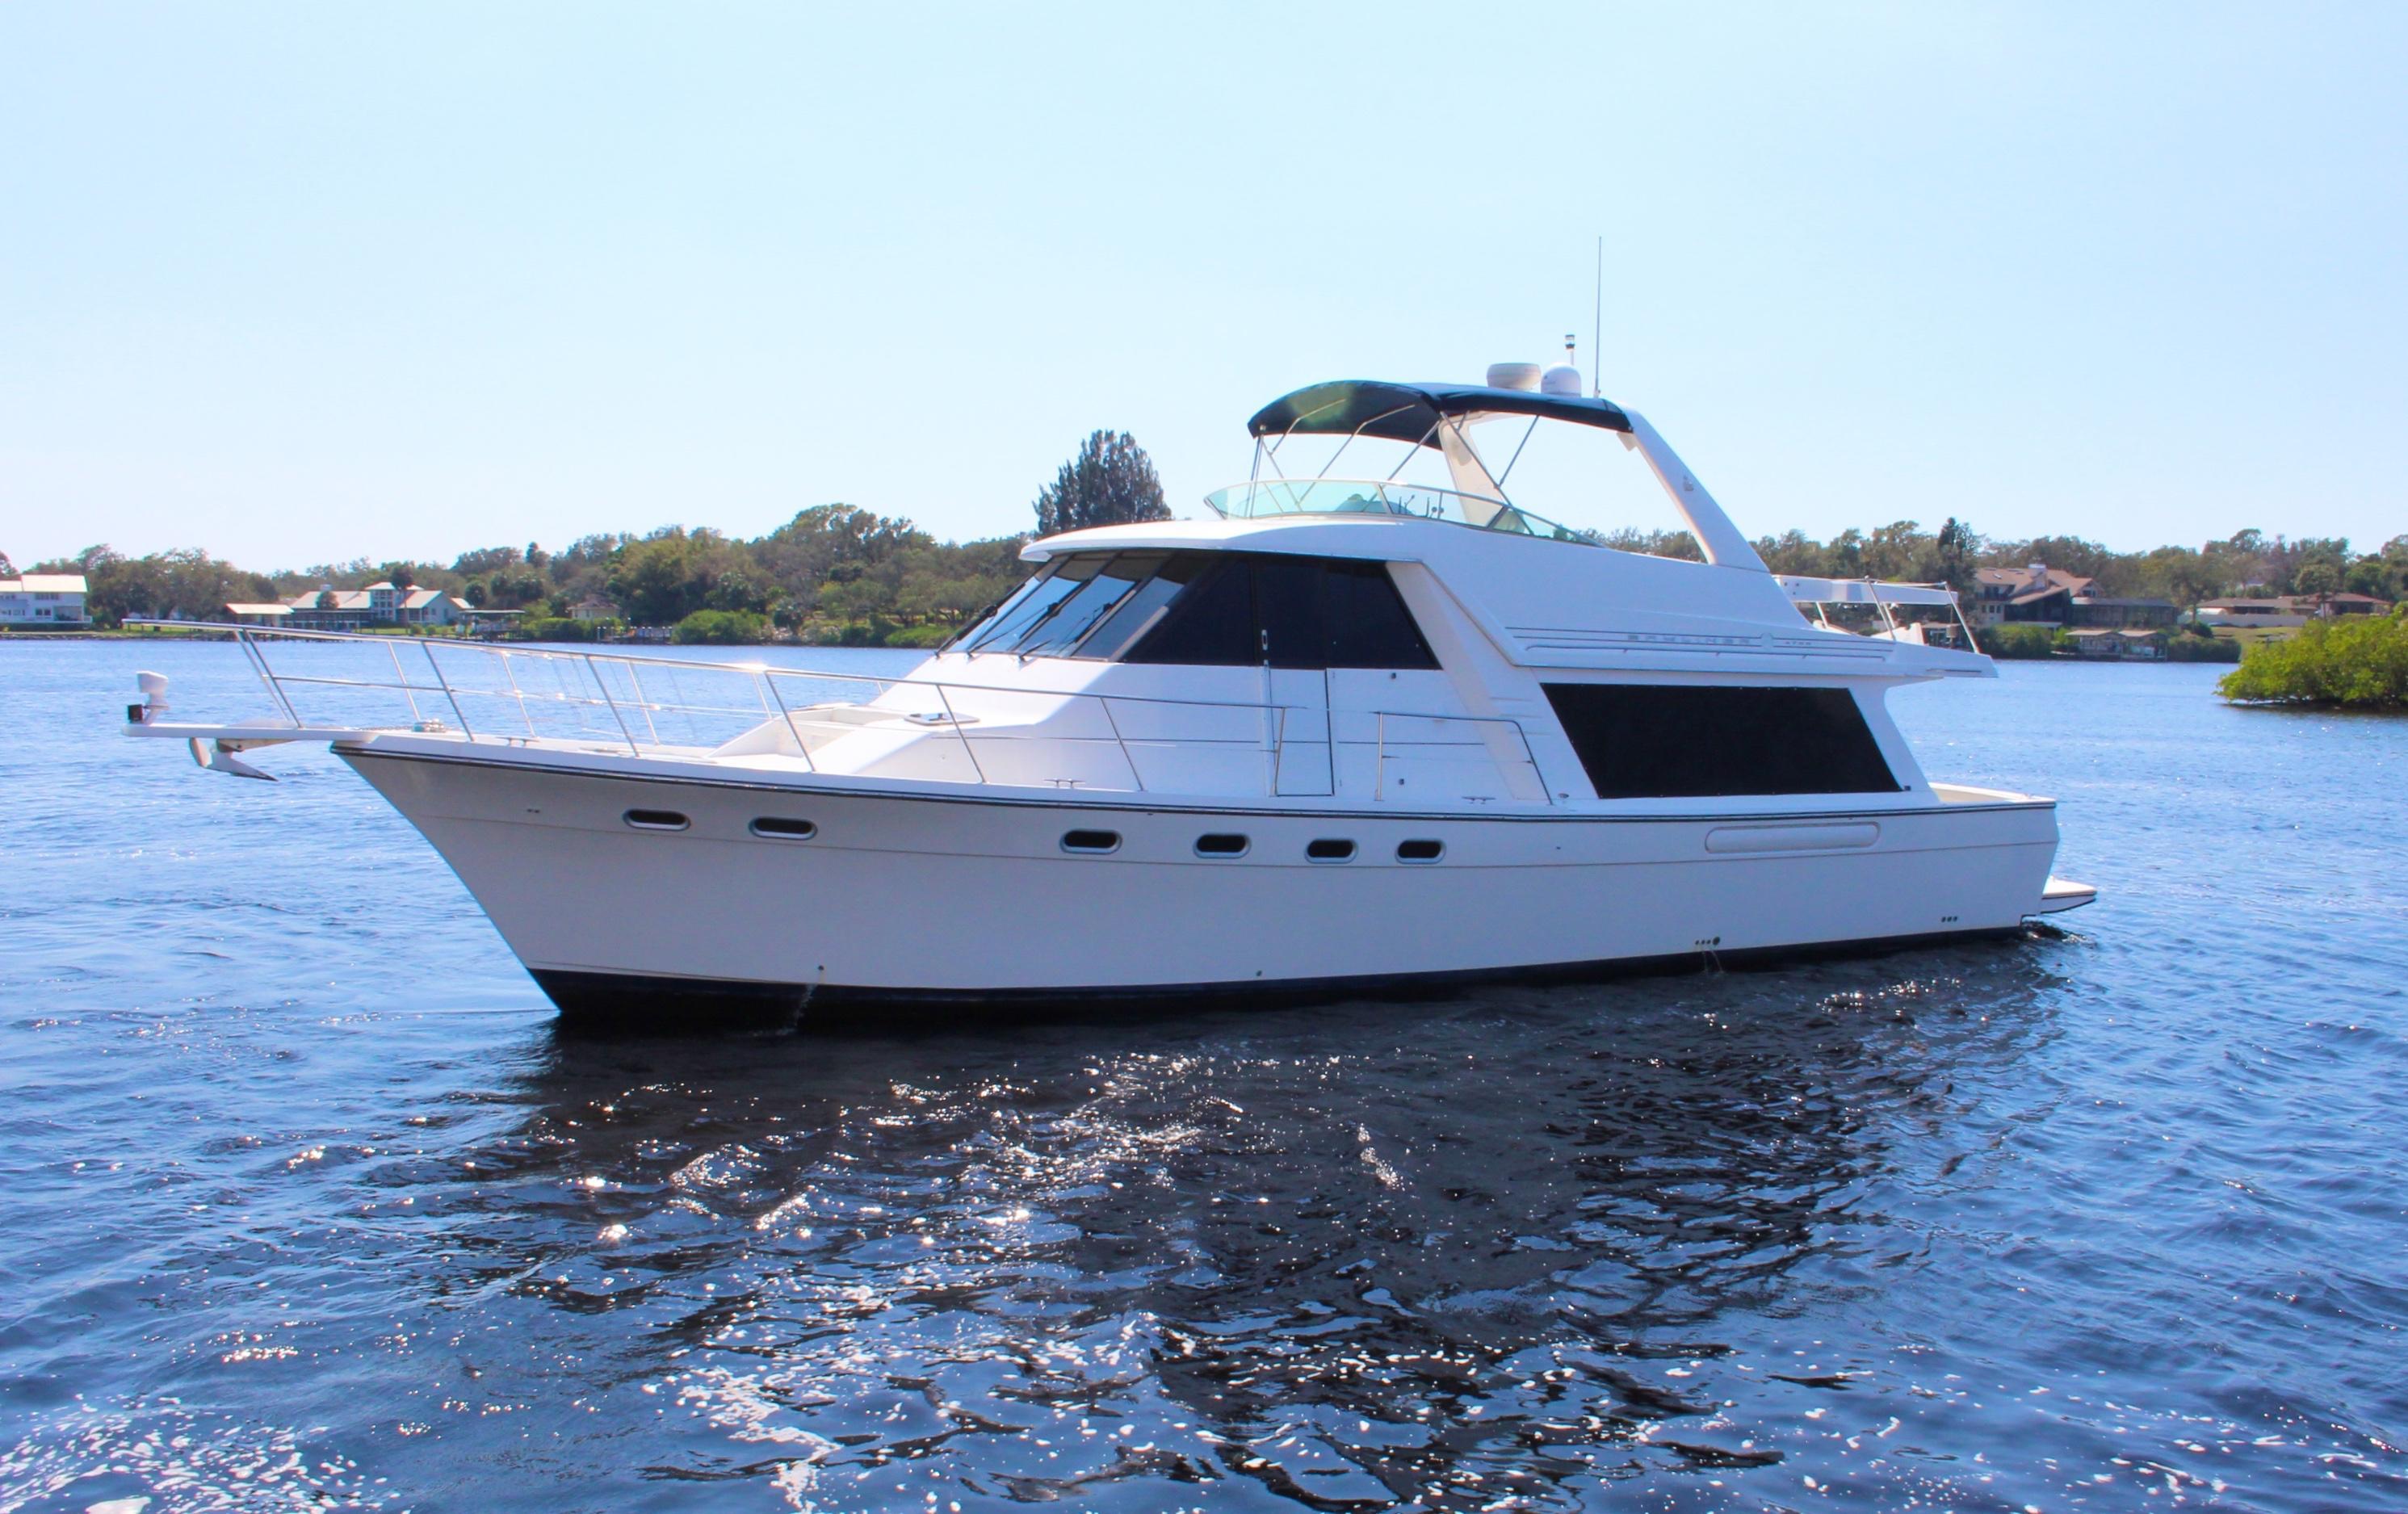 2000 Bayliner 4788 Pilot House Motoryacht Power Boat For